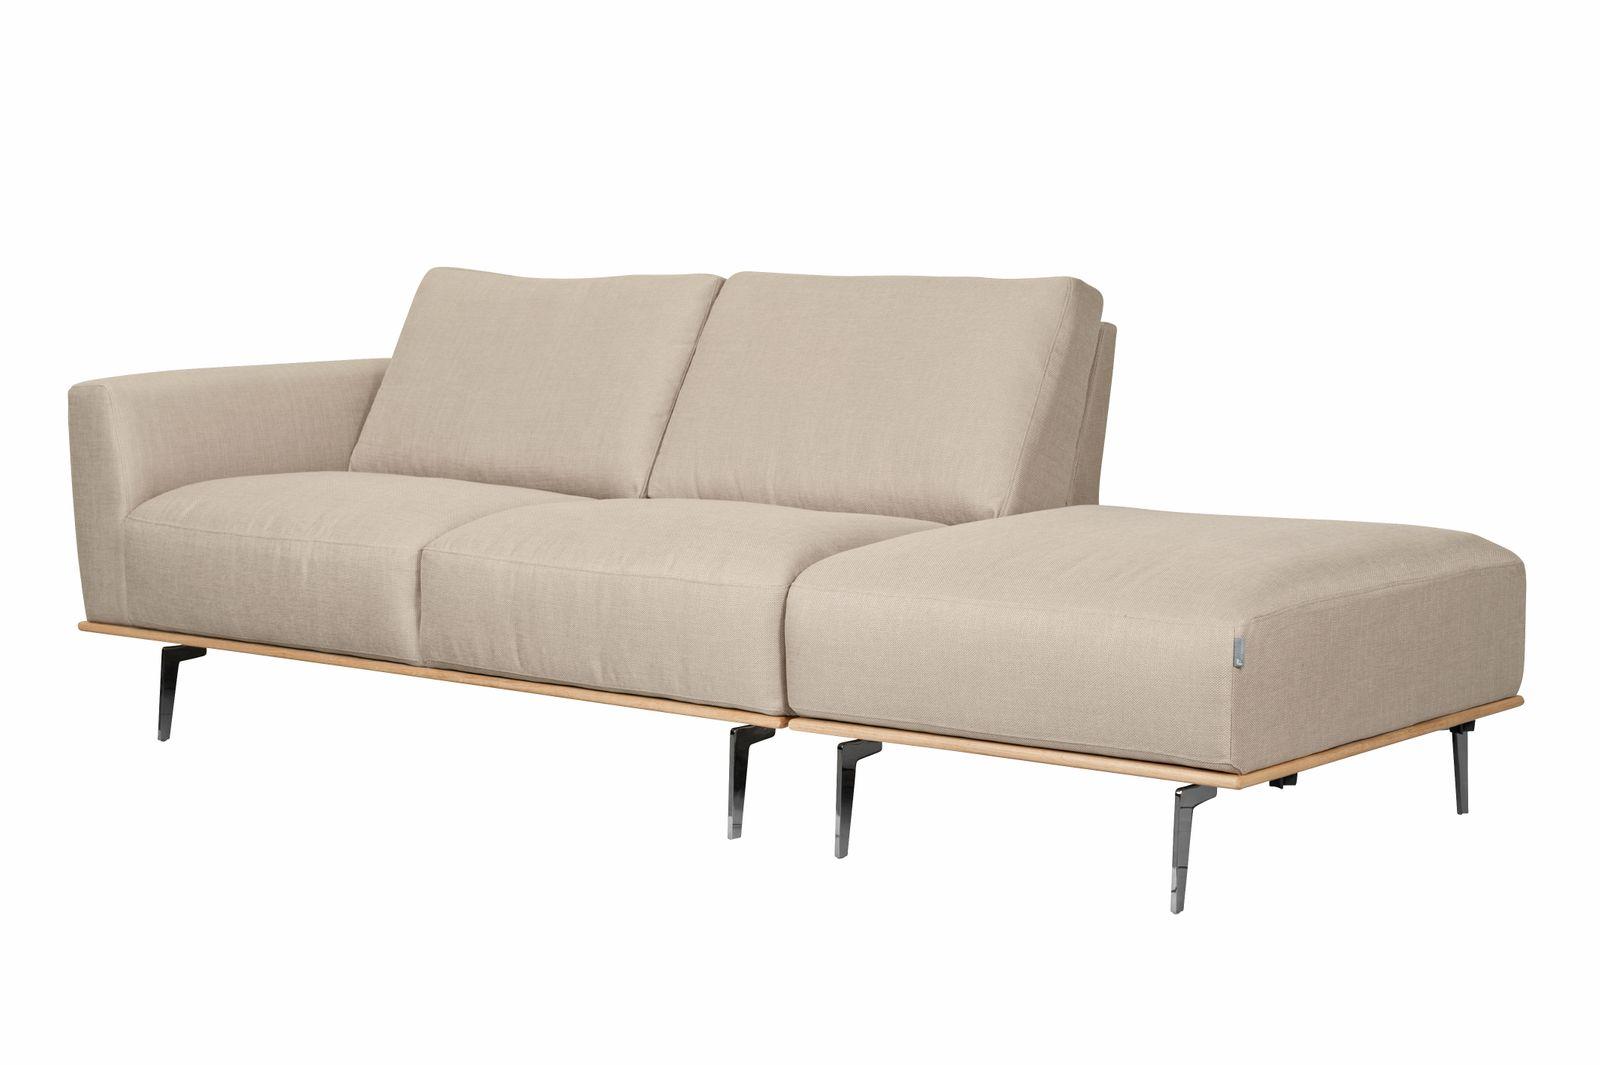 furninova sofa noir mit hocker und holzrahmen manufaktur. Black Bedroom Furniture Sets. Home Design Ideas